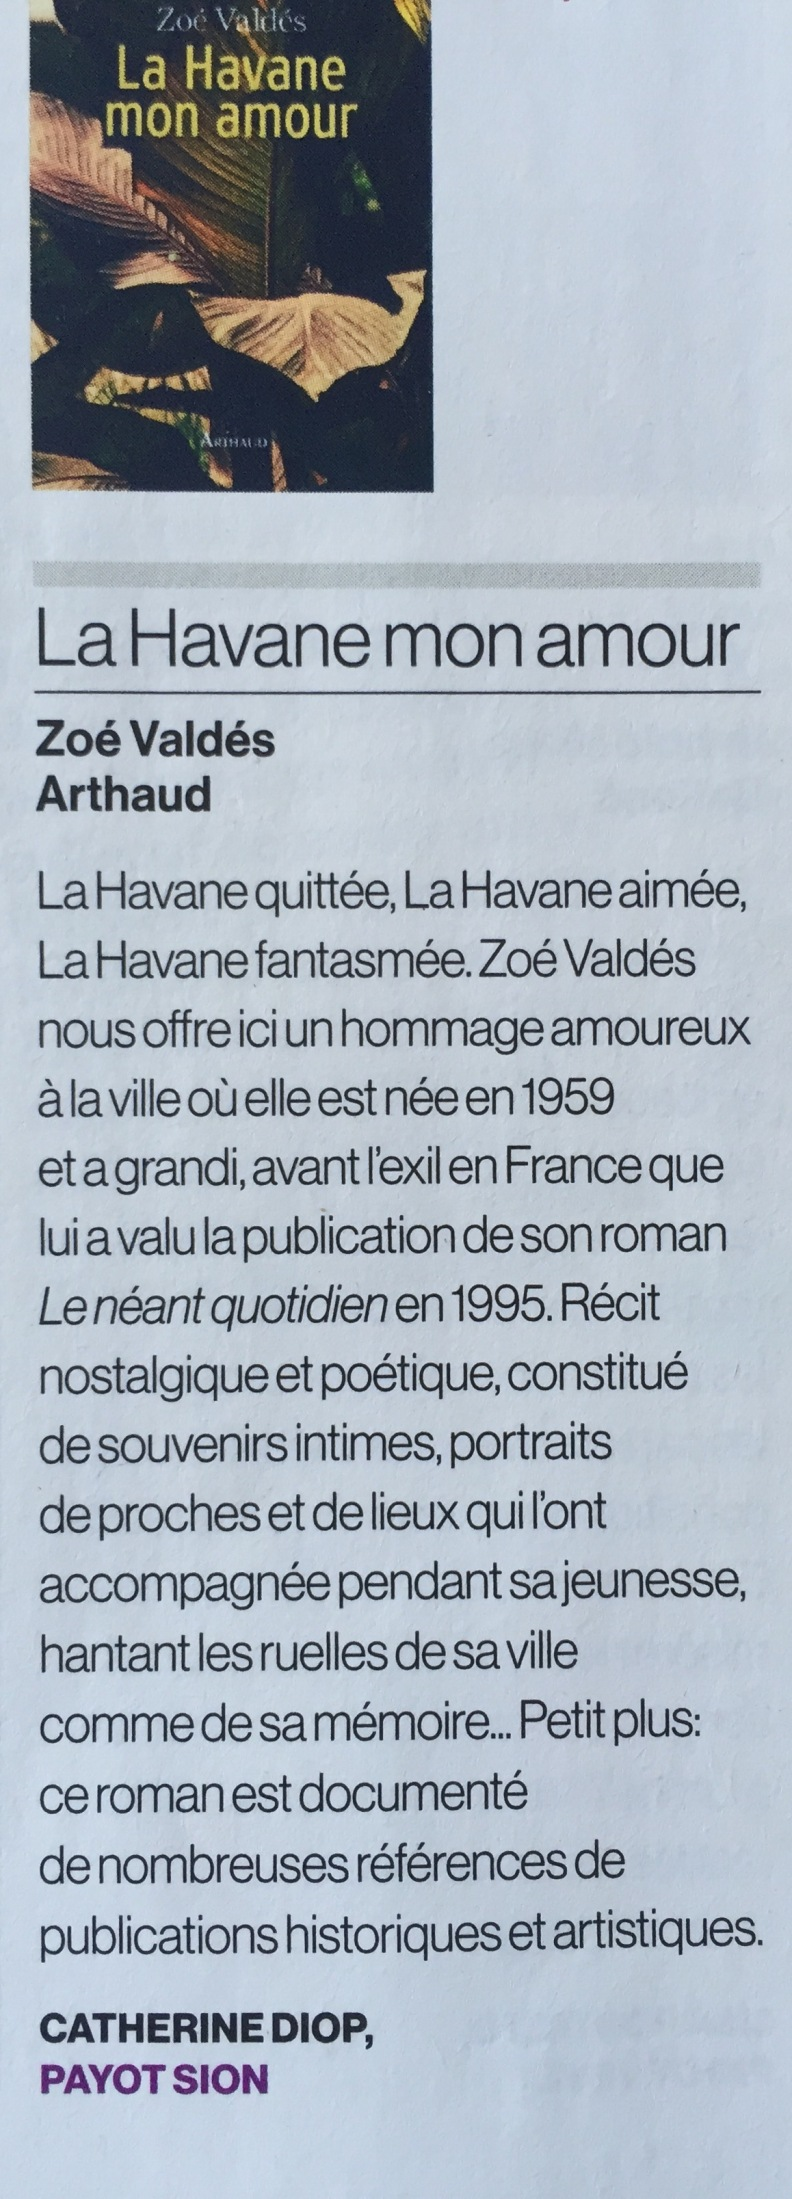 La Havane, mon amour Hebdo Suisse